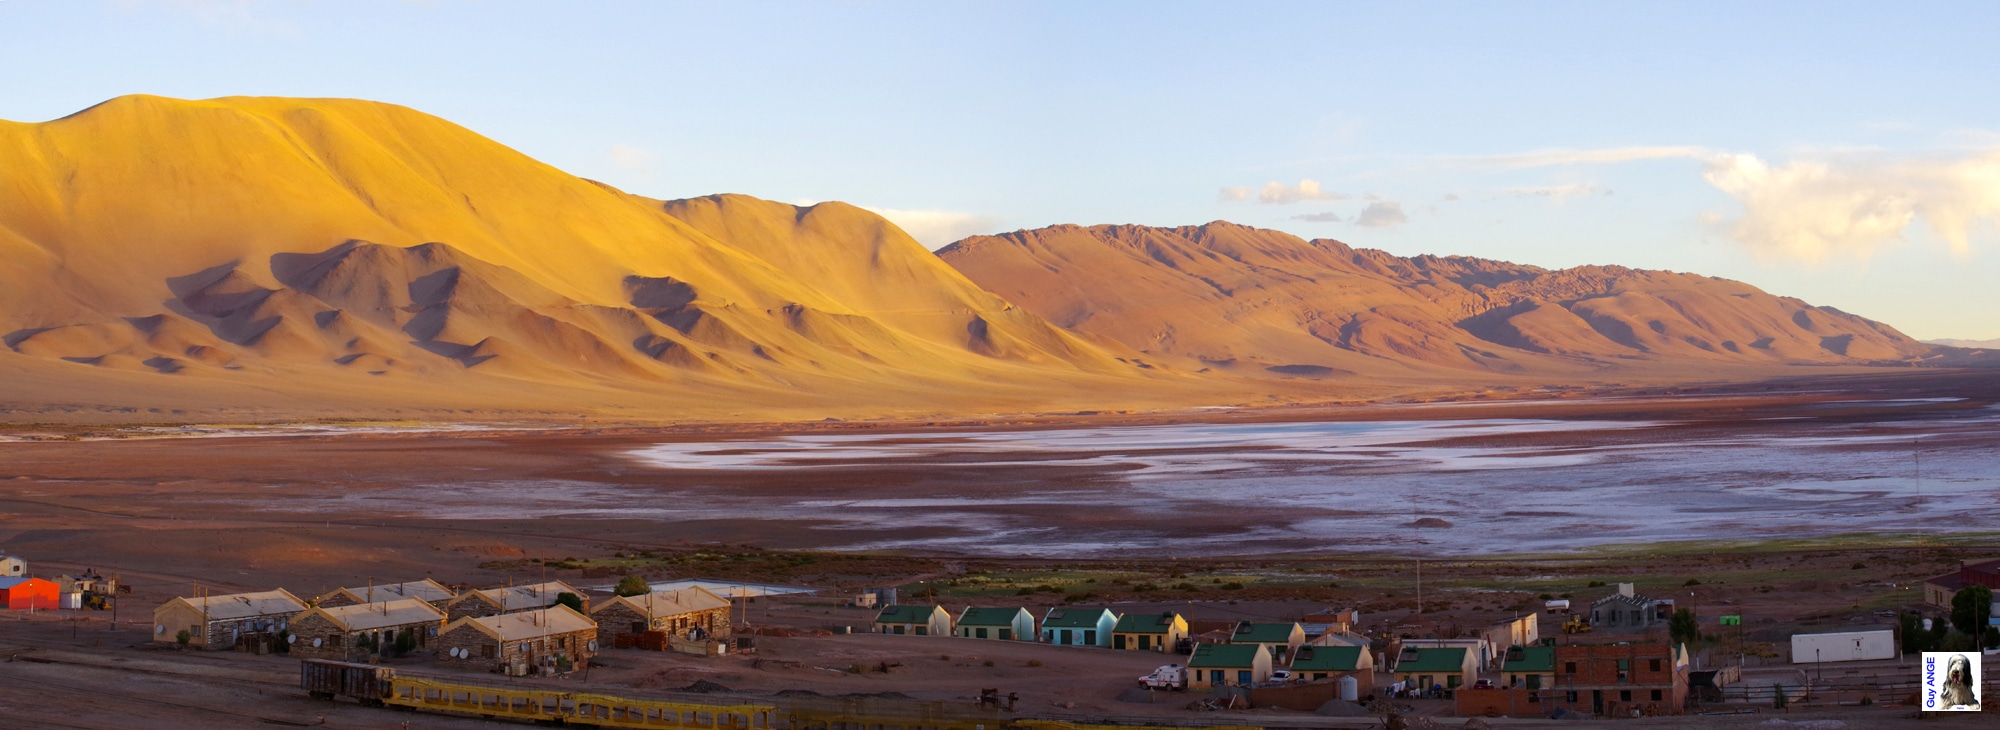 Argentine, Tolar Grande au soleil couchant.